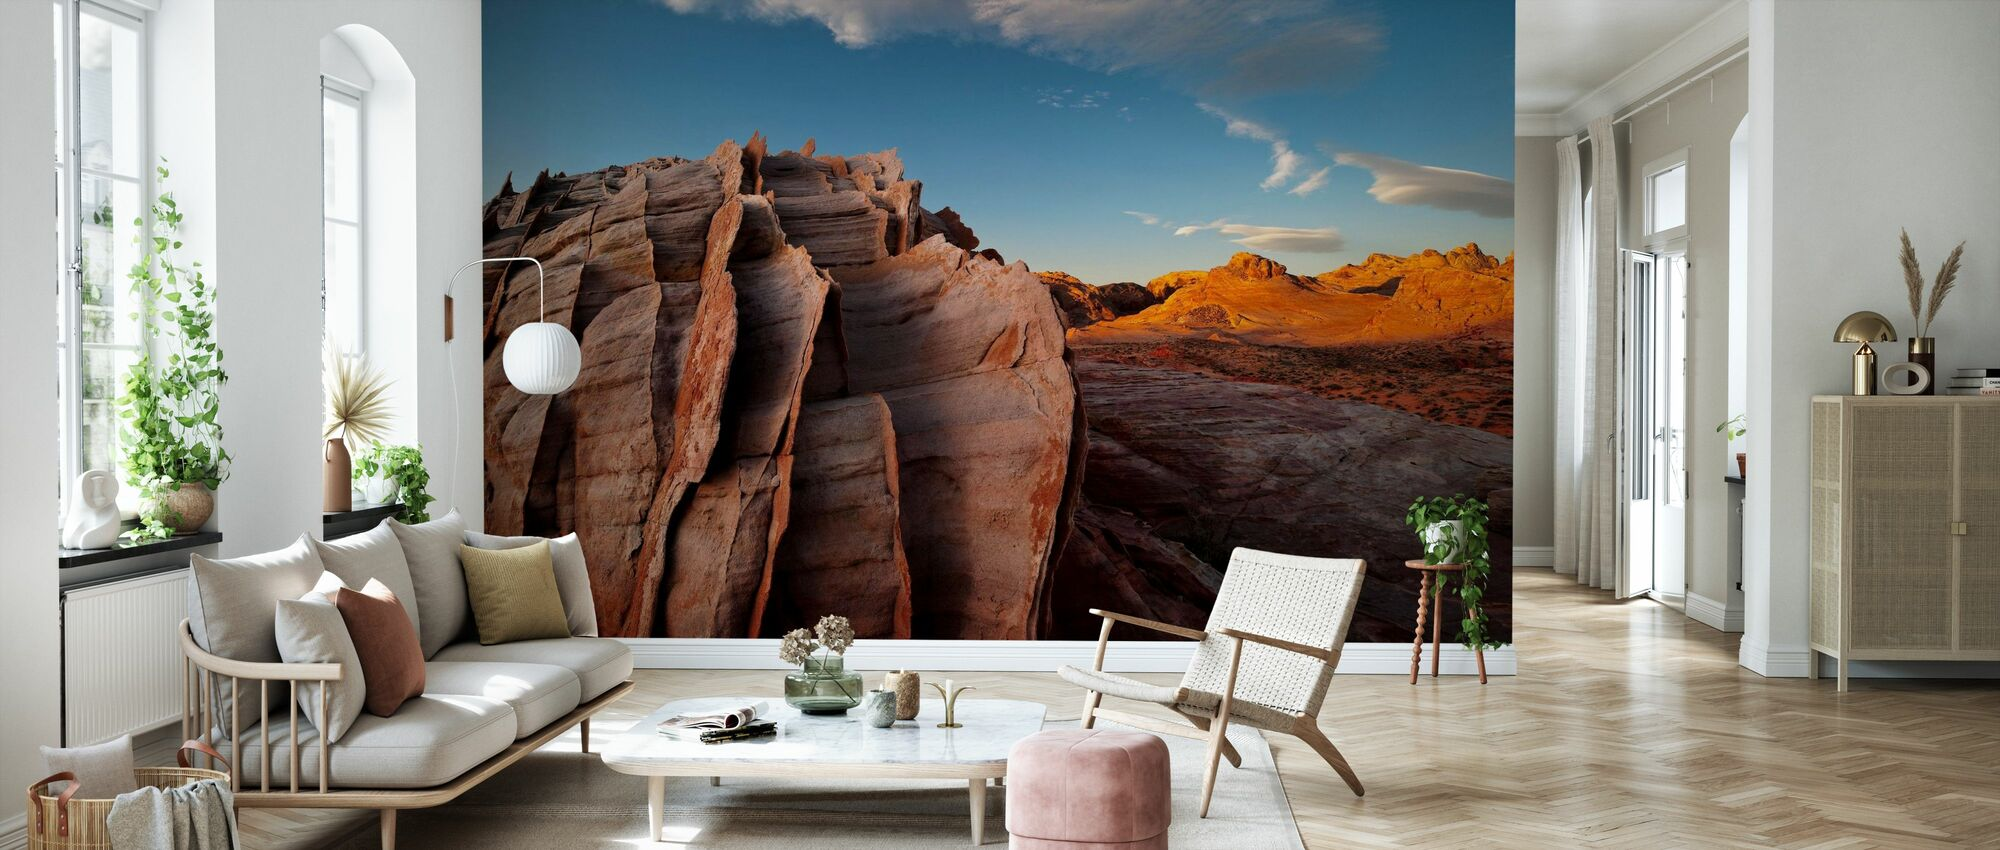 Eroded Aztec Sandstone - Wallpaper - Living Room